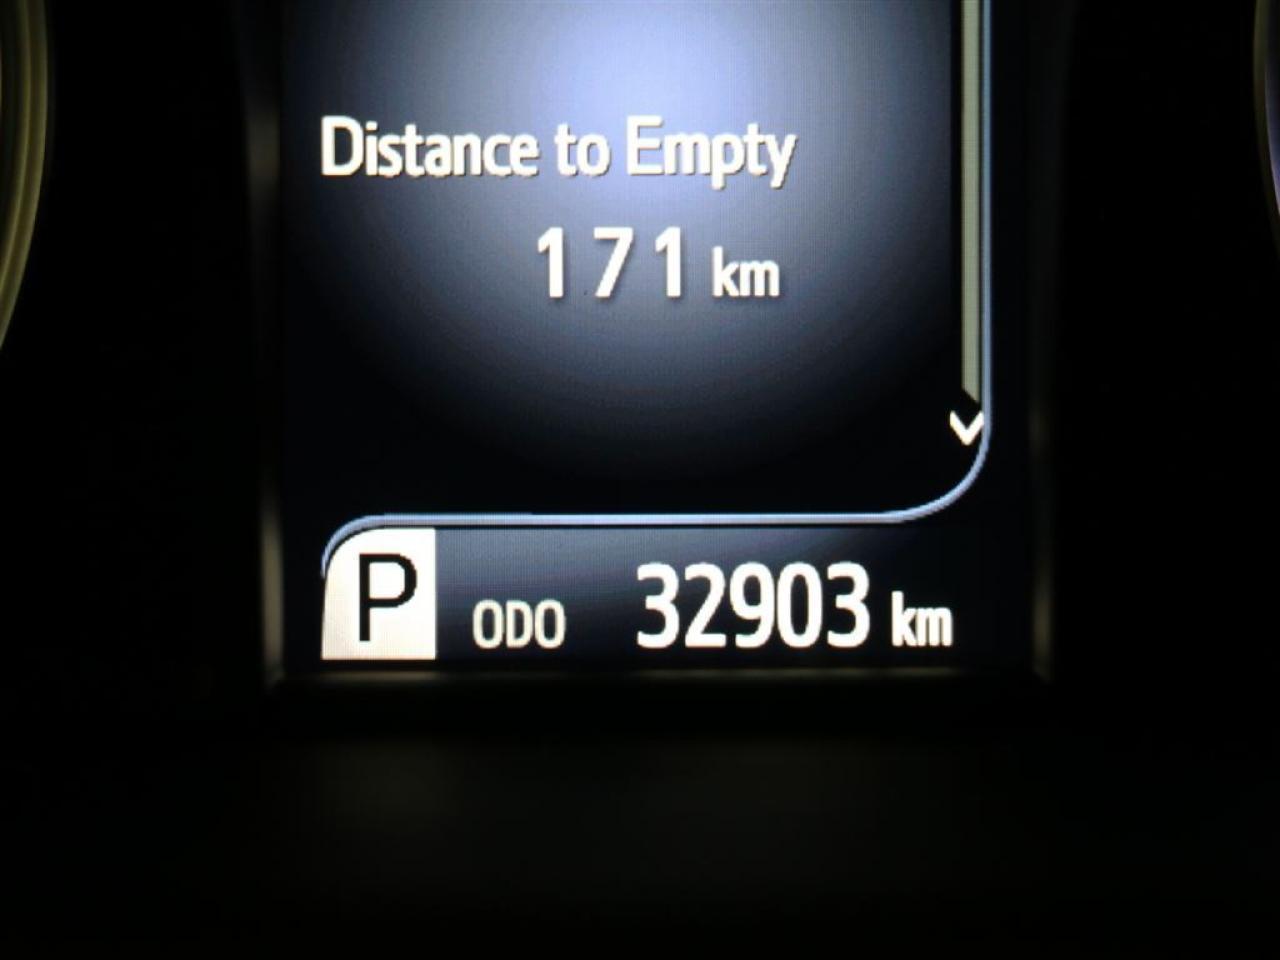 2296361